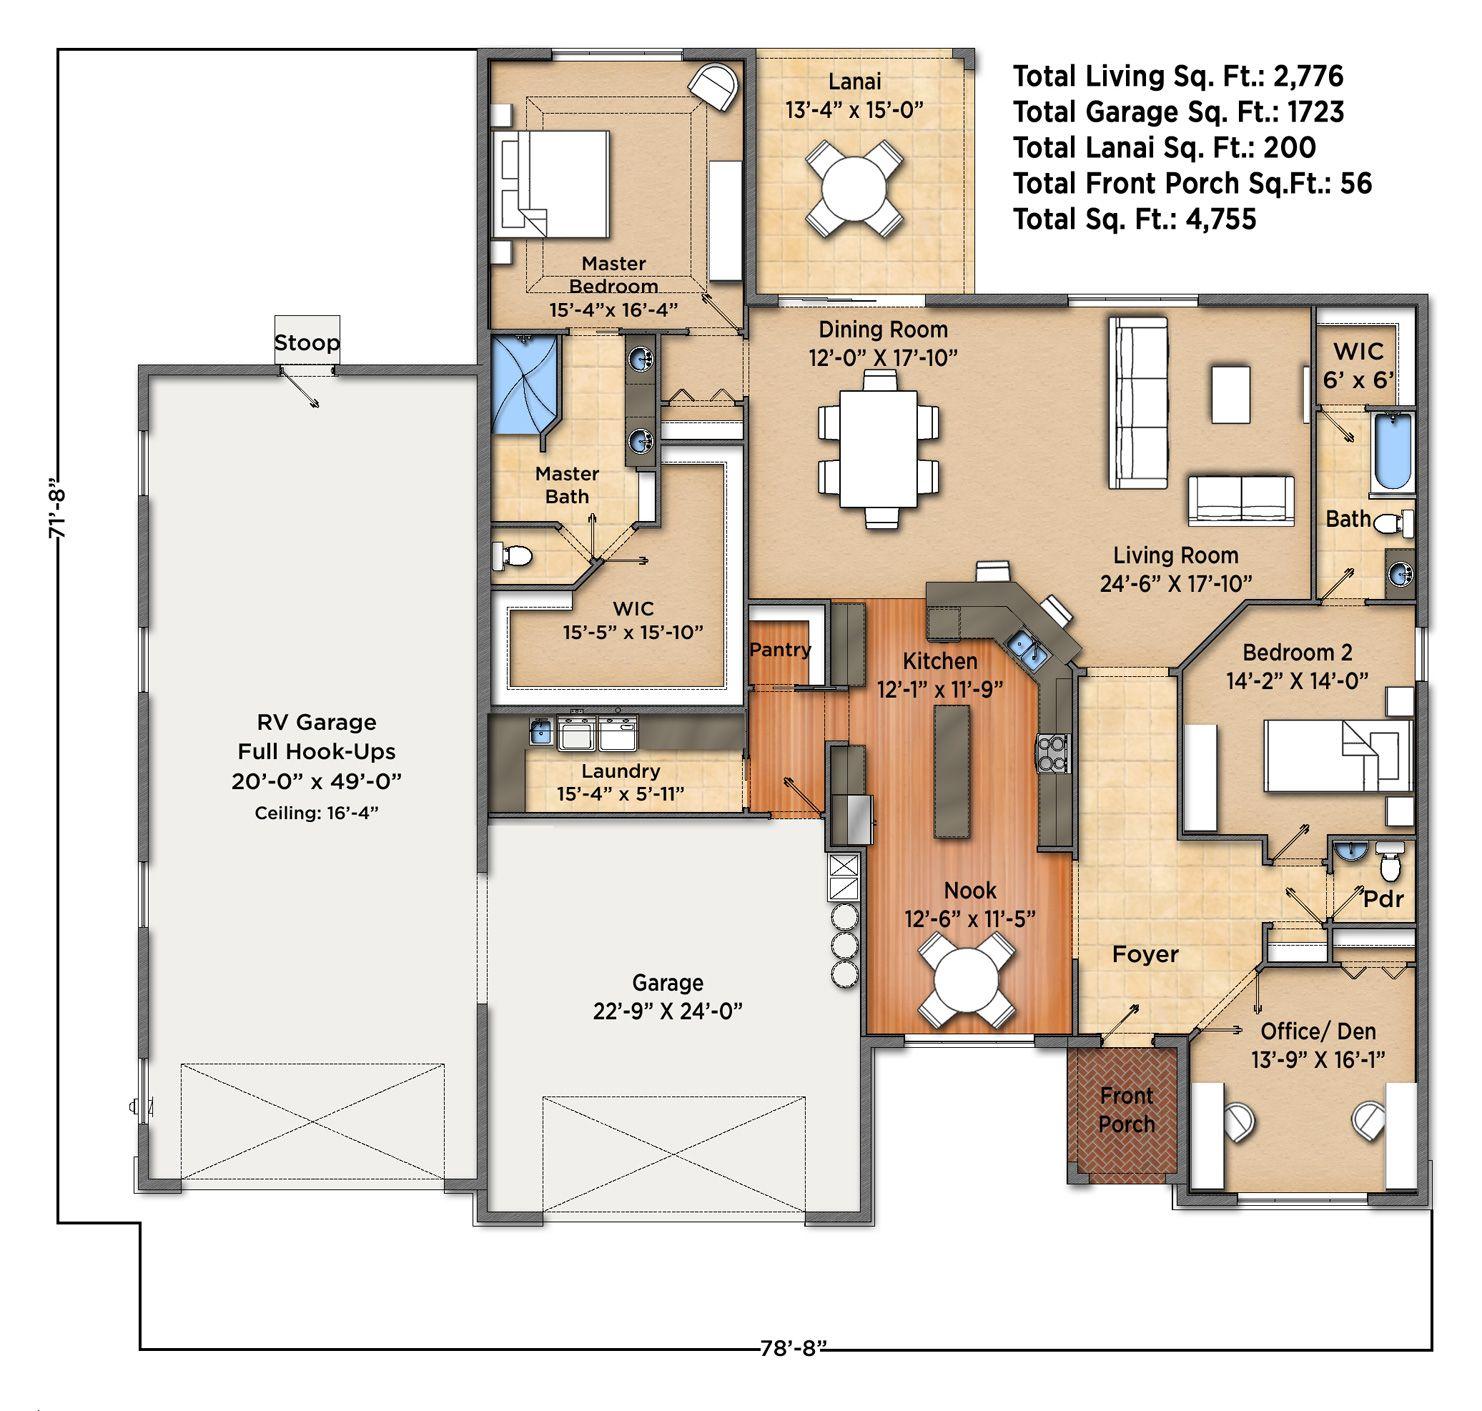 Rv Garage With Living Quarters: Sunset Harbor II Floorplan